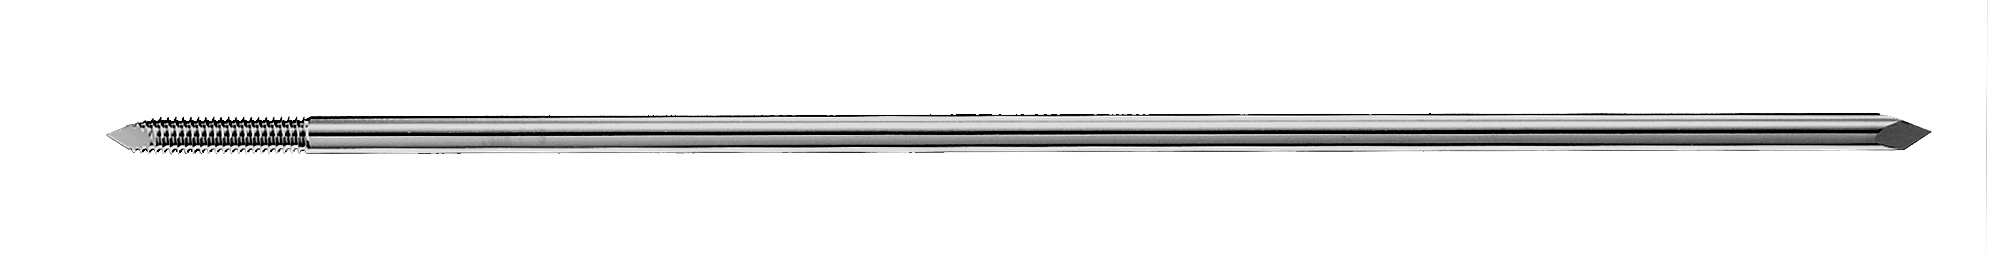 steinmann-im-pins-1-4-x-12-double-trocar-smooth-27-190-miltex.jpg